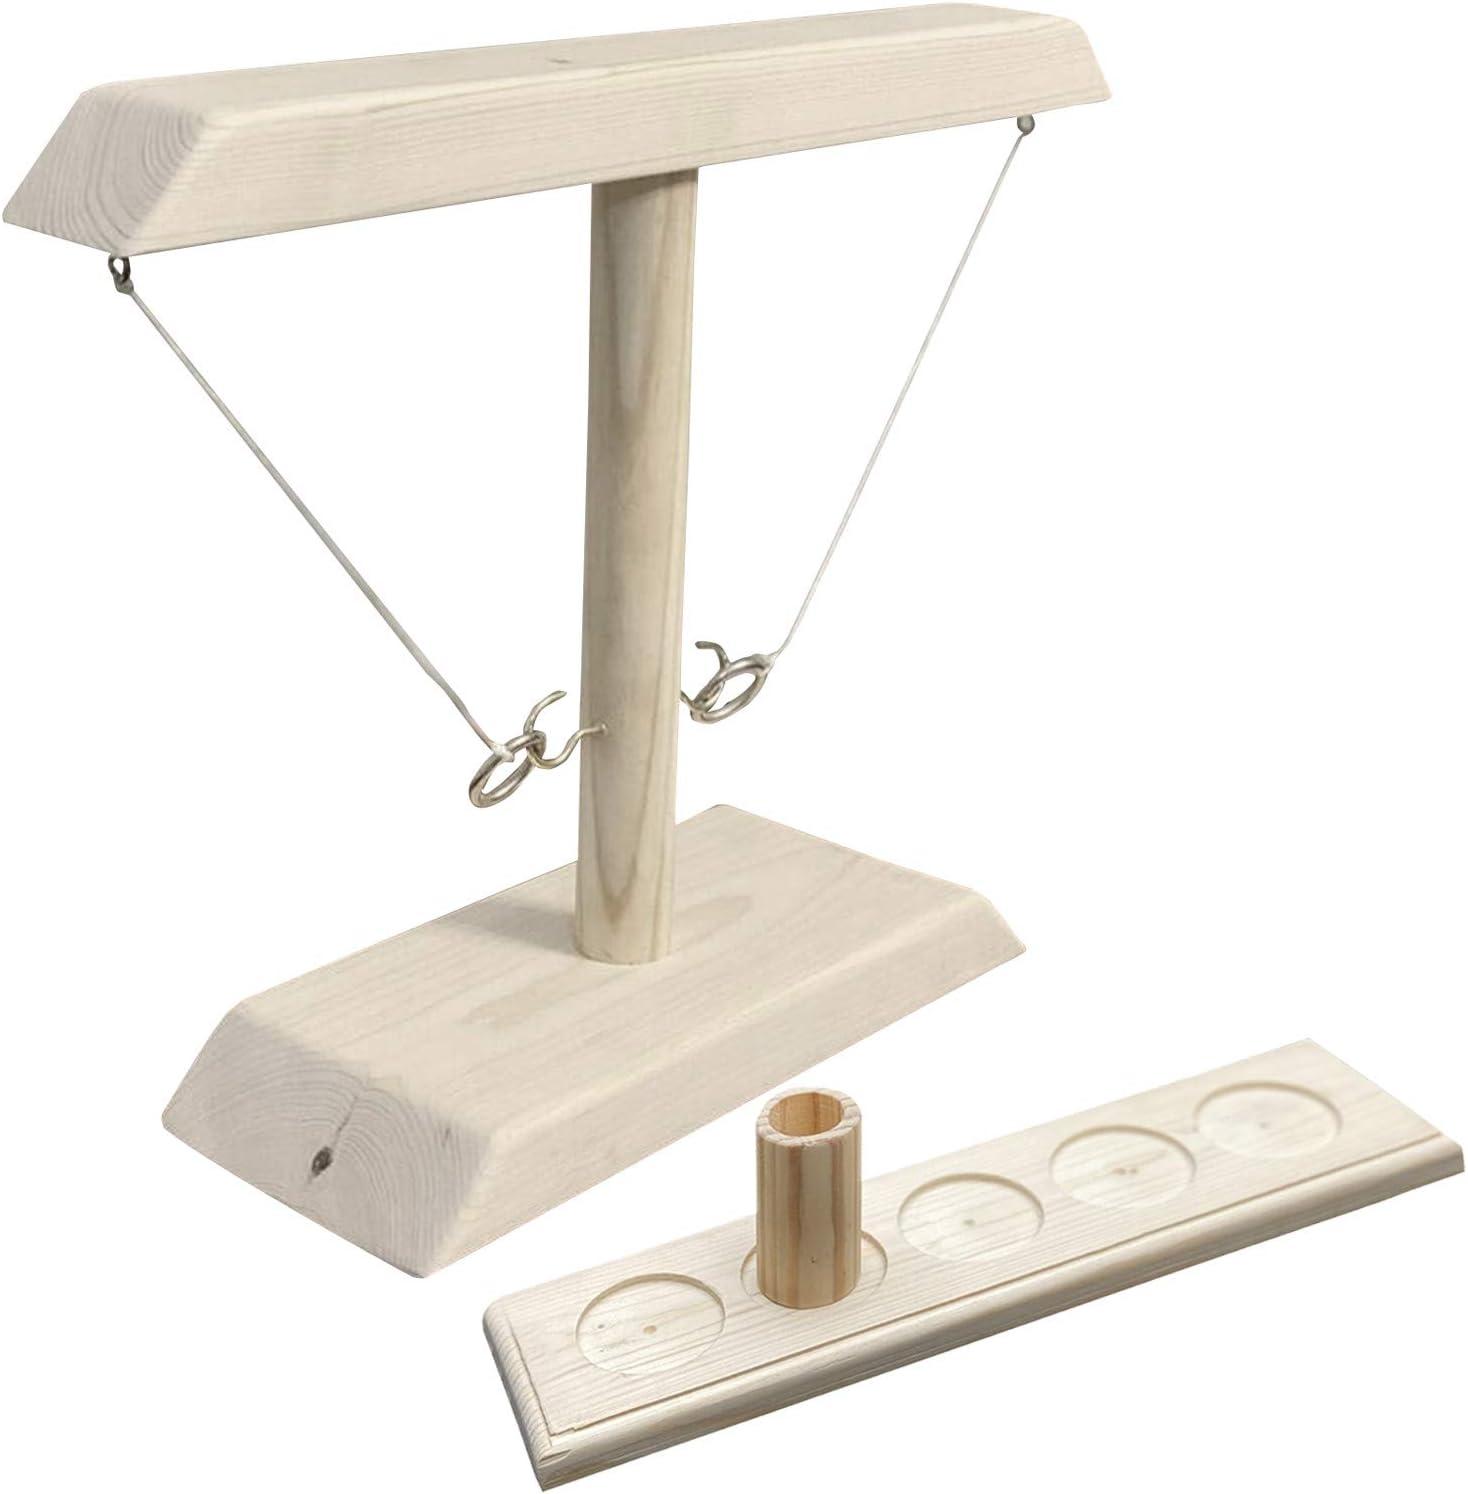 ZURITI Ring toss game hook and shot ladder game ring toss hook and ring indoor//outdoor game upgraded toss game-fun sports novelty toy Brown handmade wooden ring toss hooks